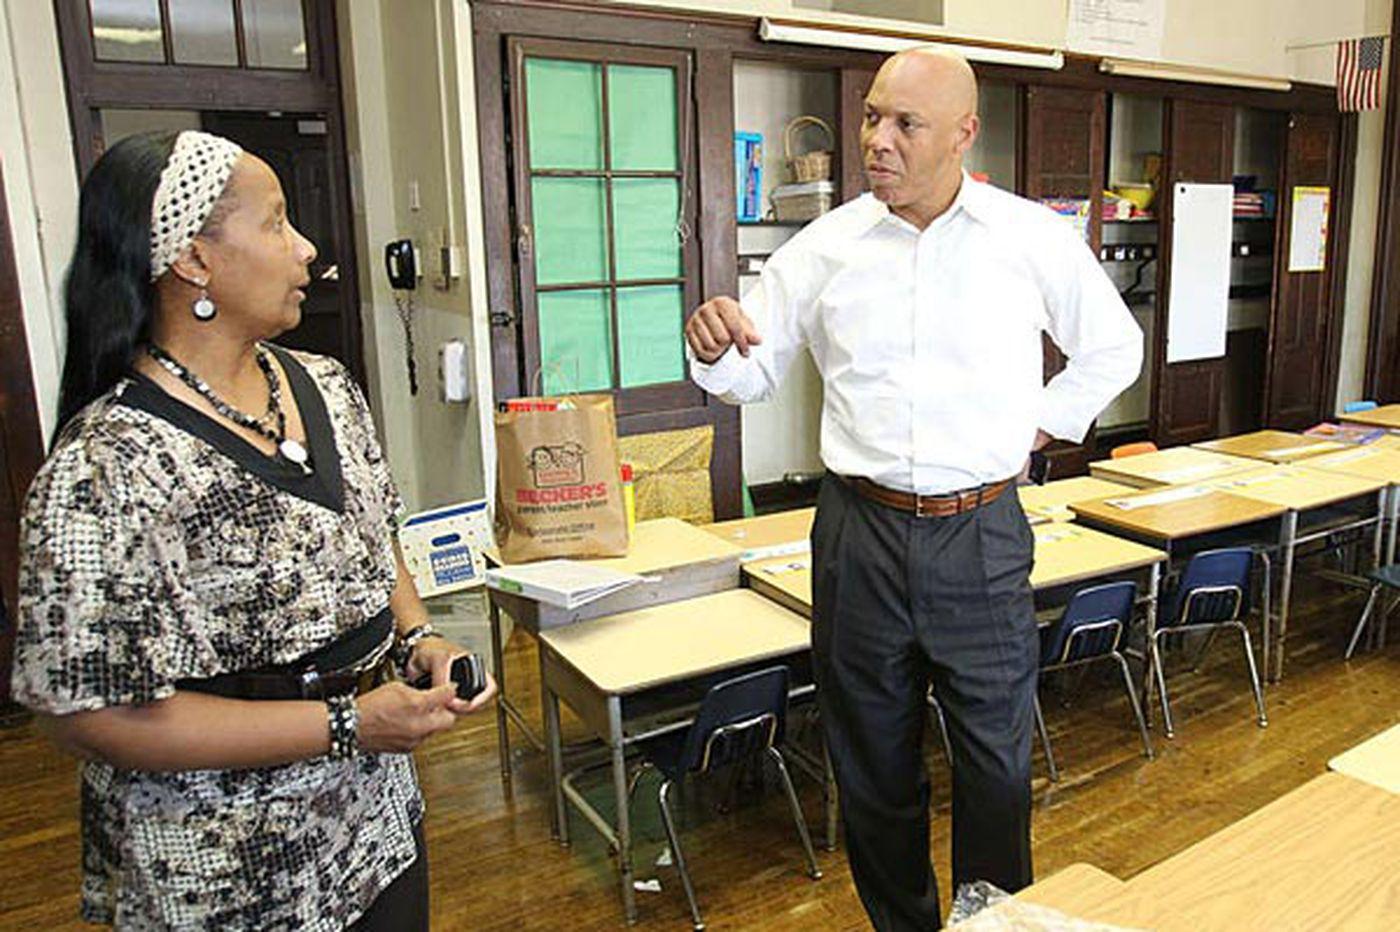 Gov. Corbett releases funding for city schools